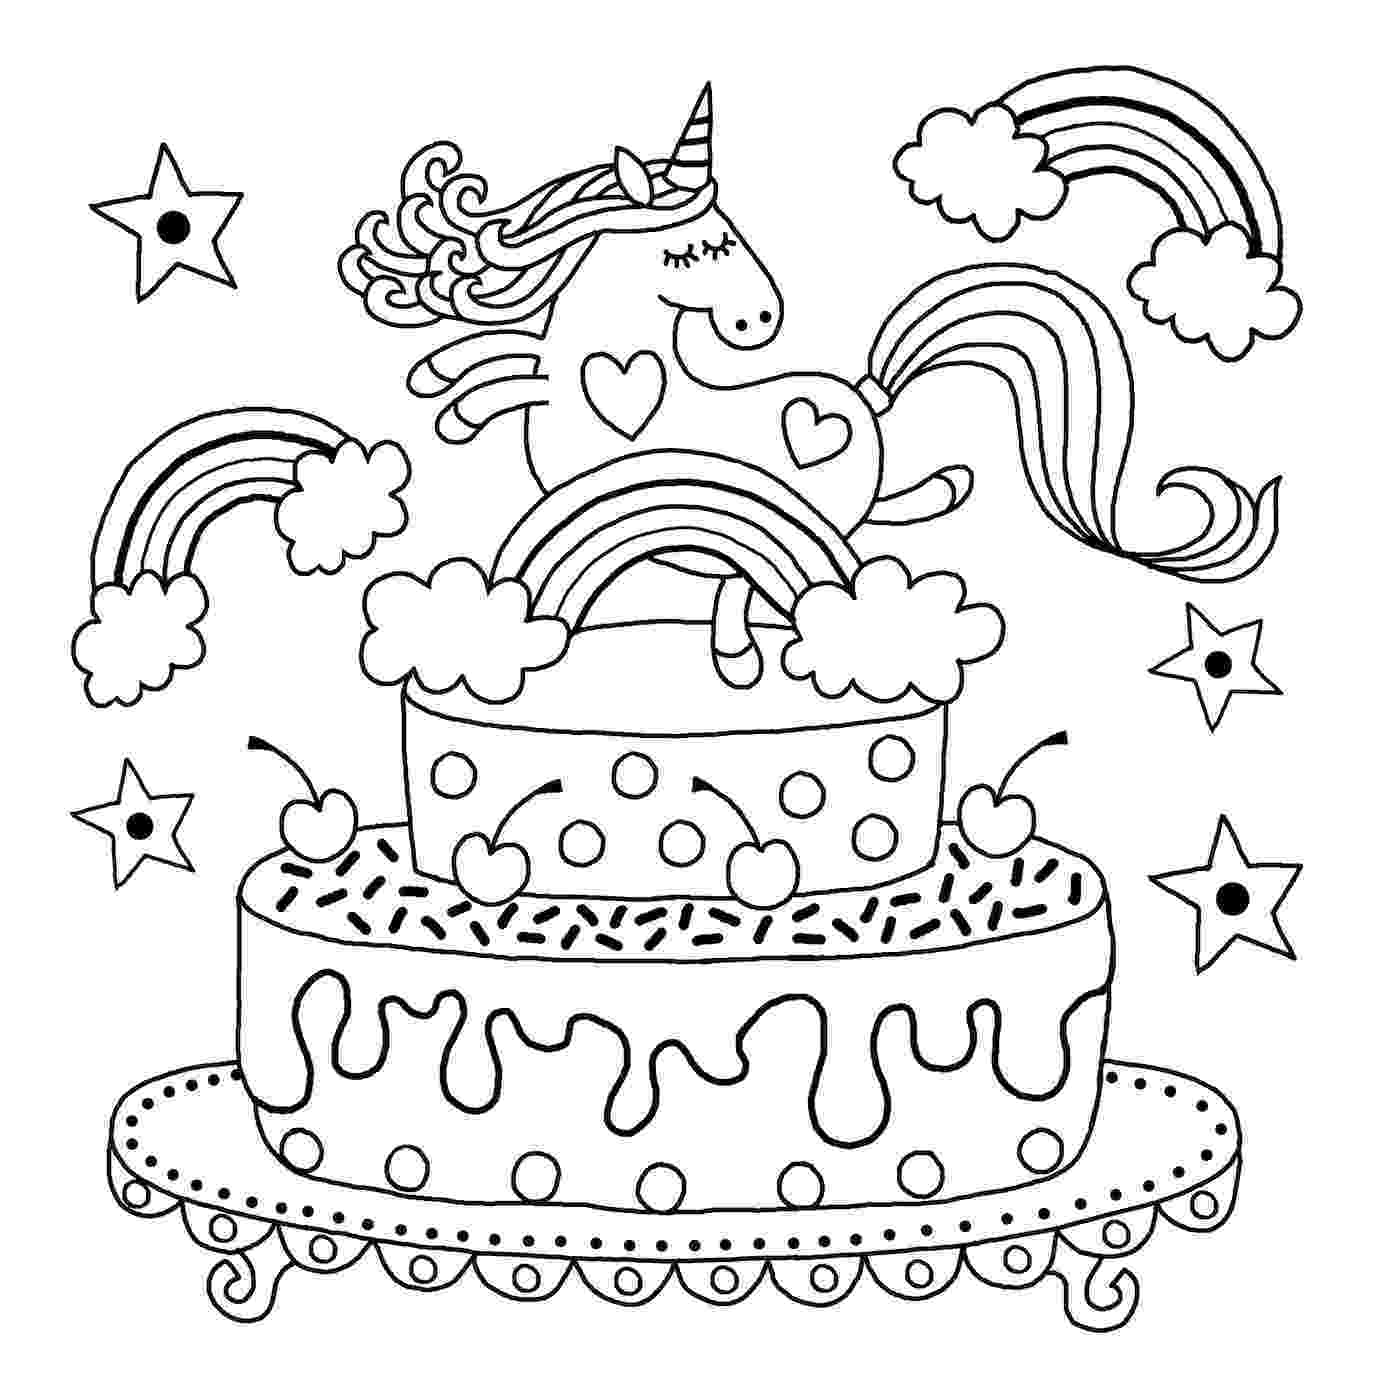 coloring page unicorn downloadable unicorn colouring page michael o39mara books coloring unicorn page